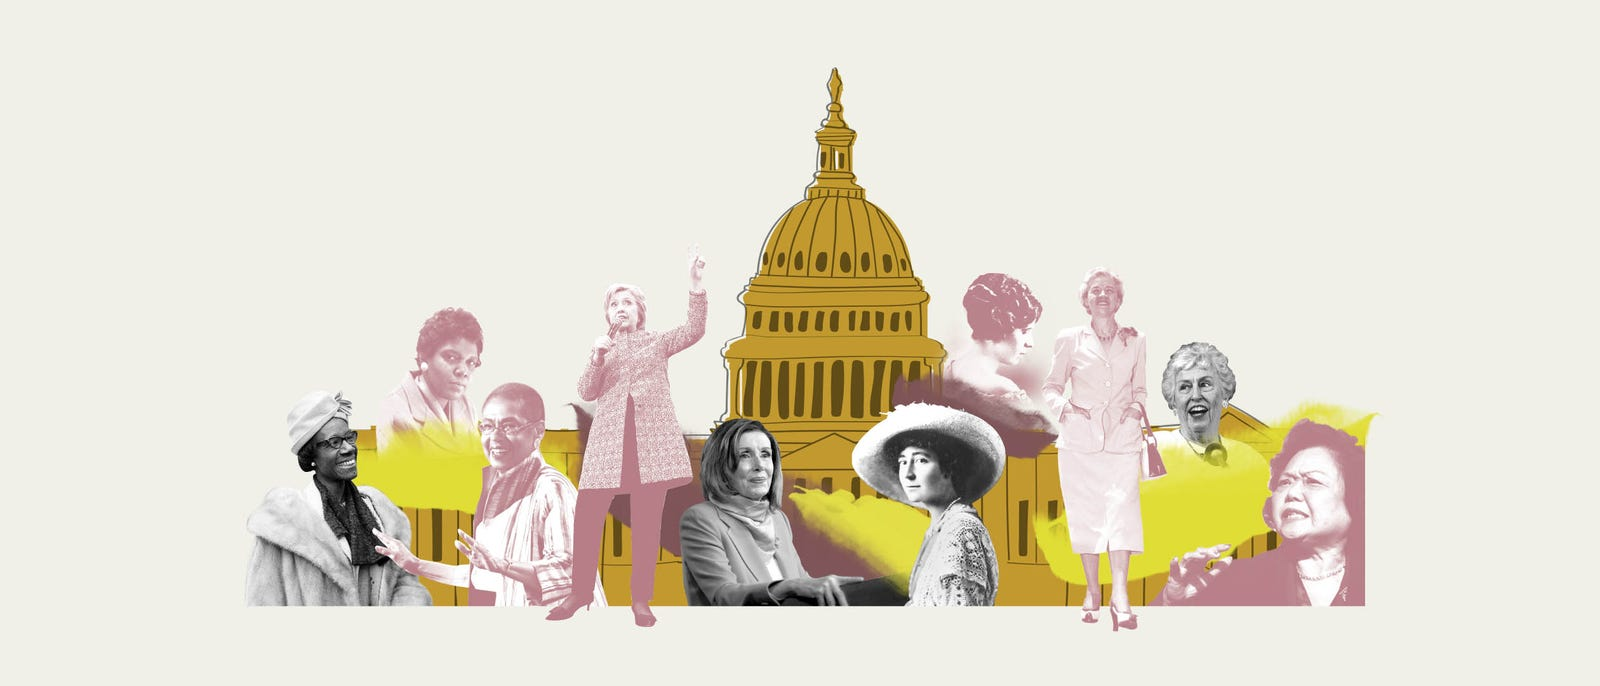 https://www.gannett-cdn.com/indepth-static-assets/uploads/master/3438476001/659b5f25-05d4-4e69-8871-2b9410eb2028-wotc-10-women-in-politics-v3.jpg